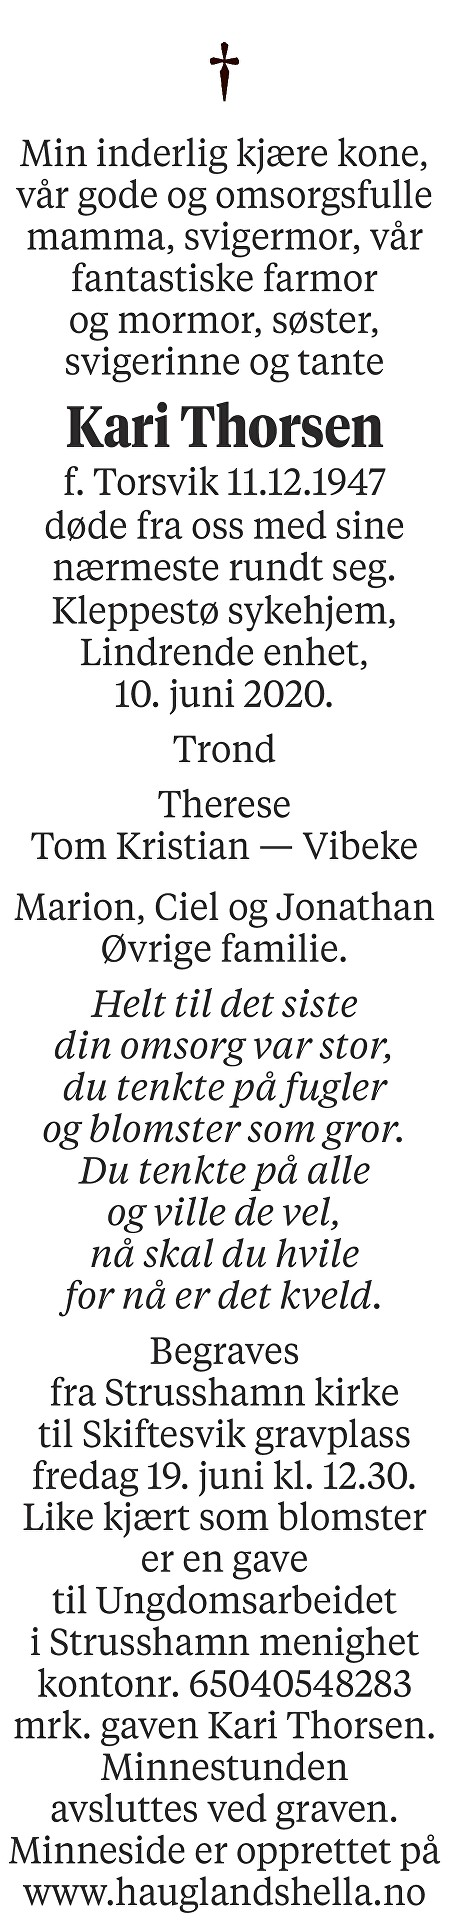 Kari Thorsen Dødsannonse